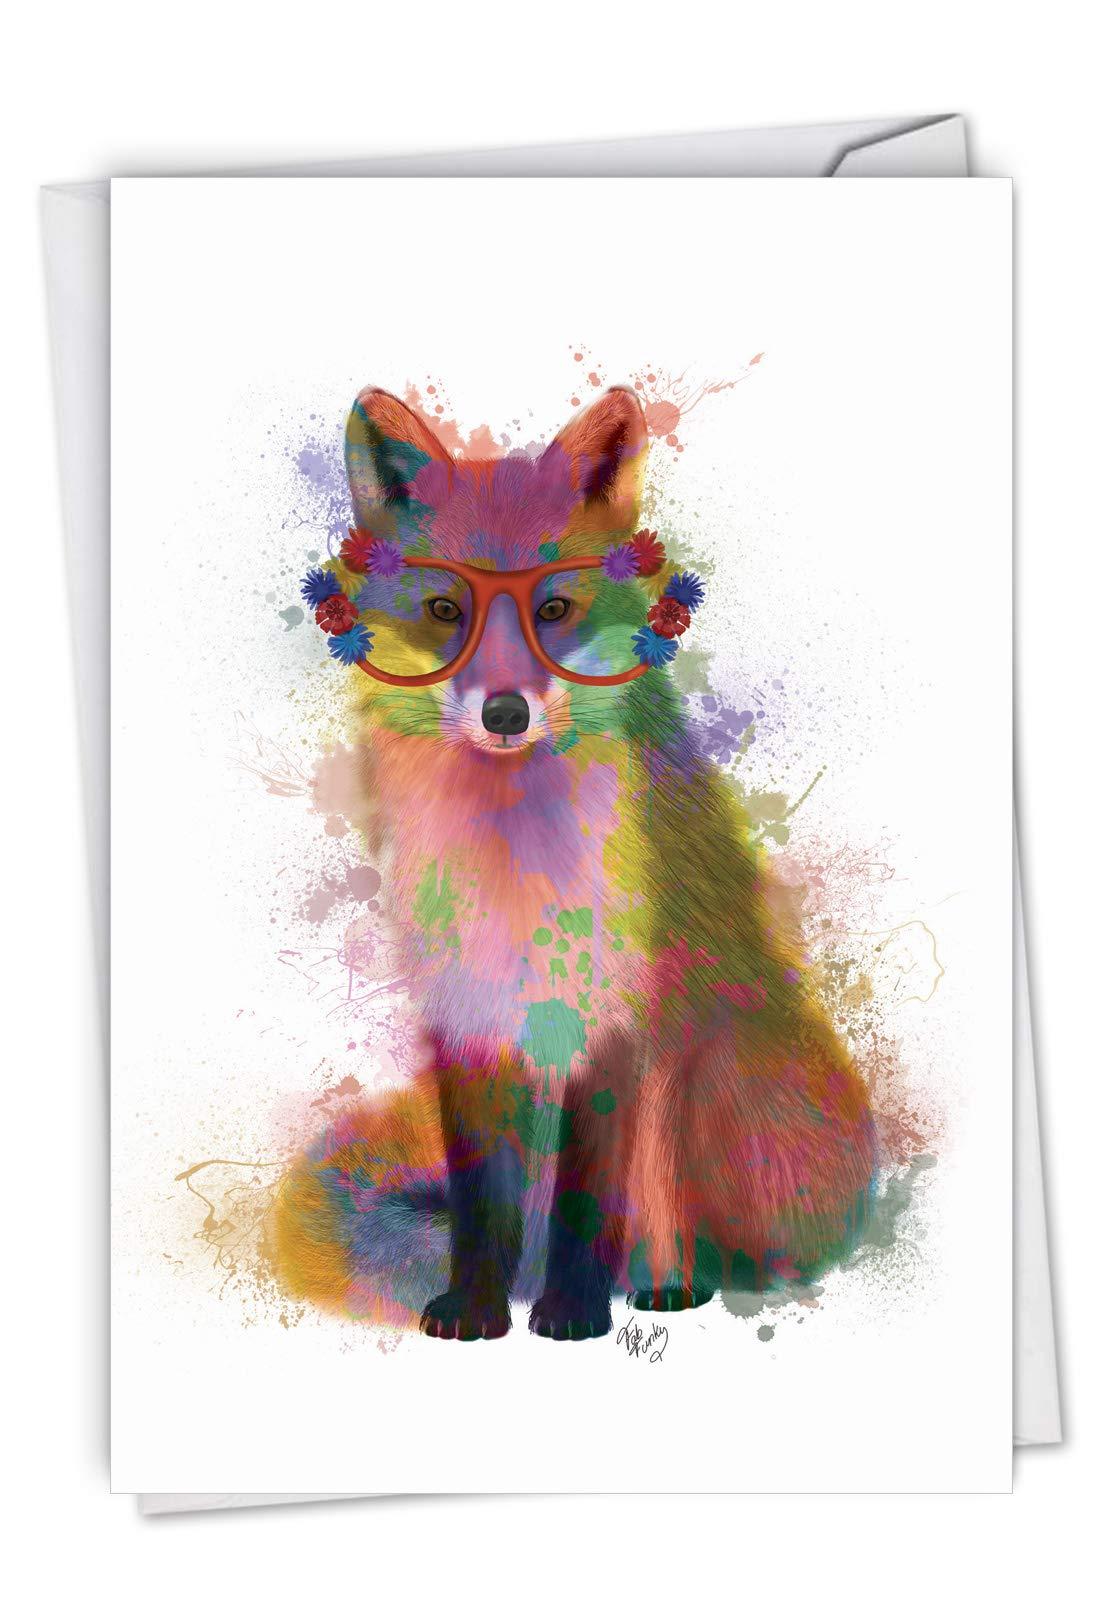 The Best Card Company, Funky Rainbow Wildlife Fox - Watercolor Birthday Card - Cute Animal Art for Kids C4948ABDG